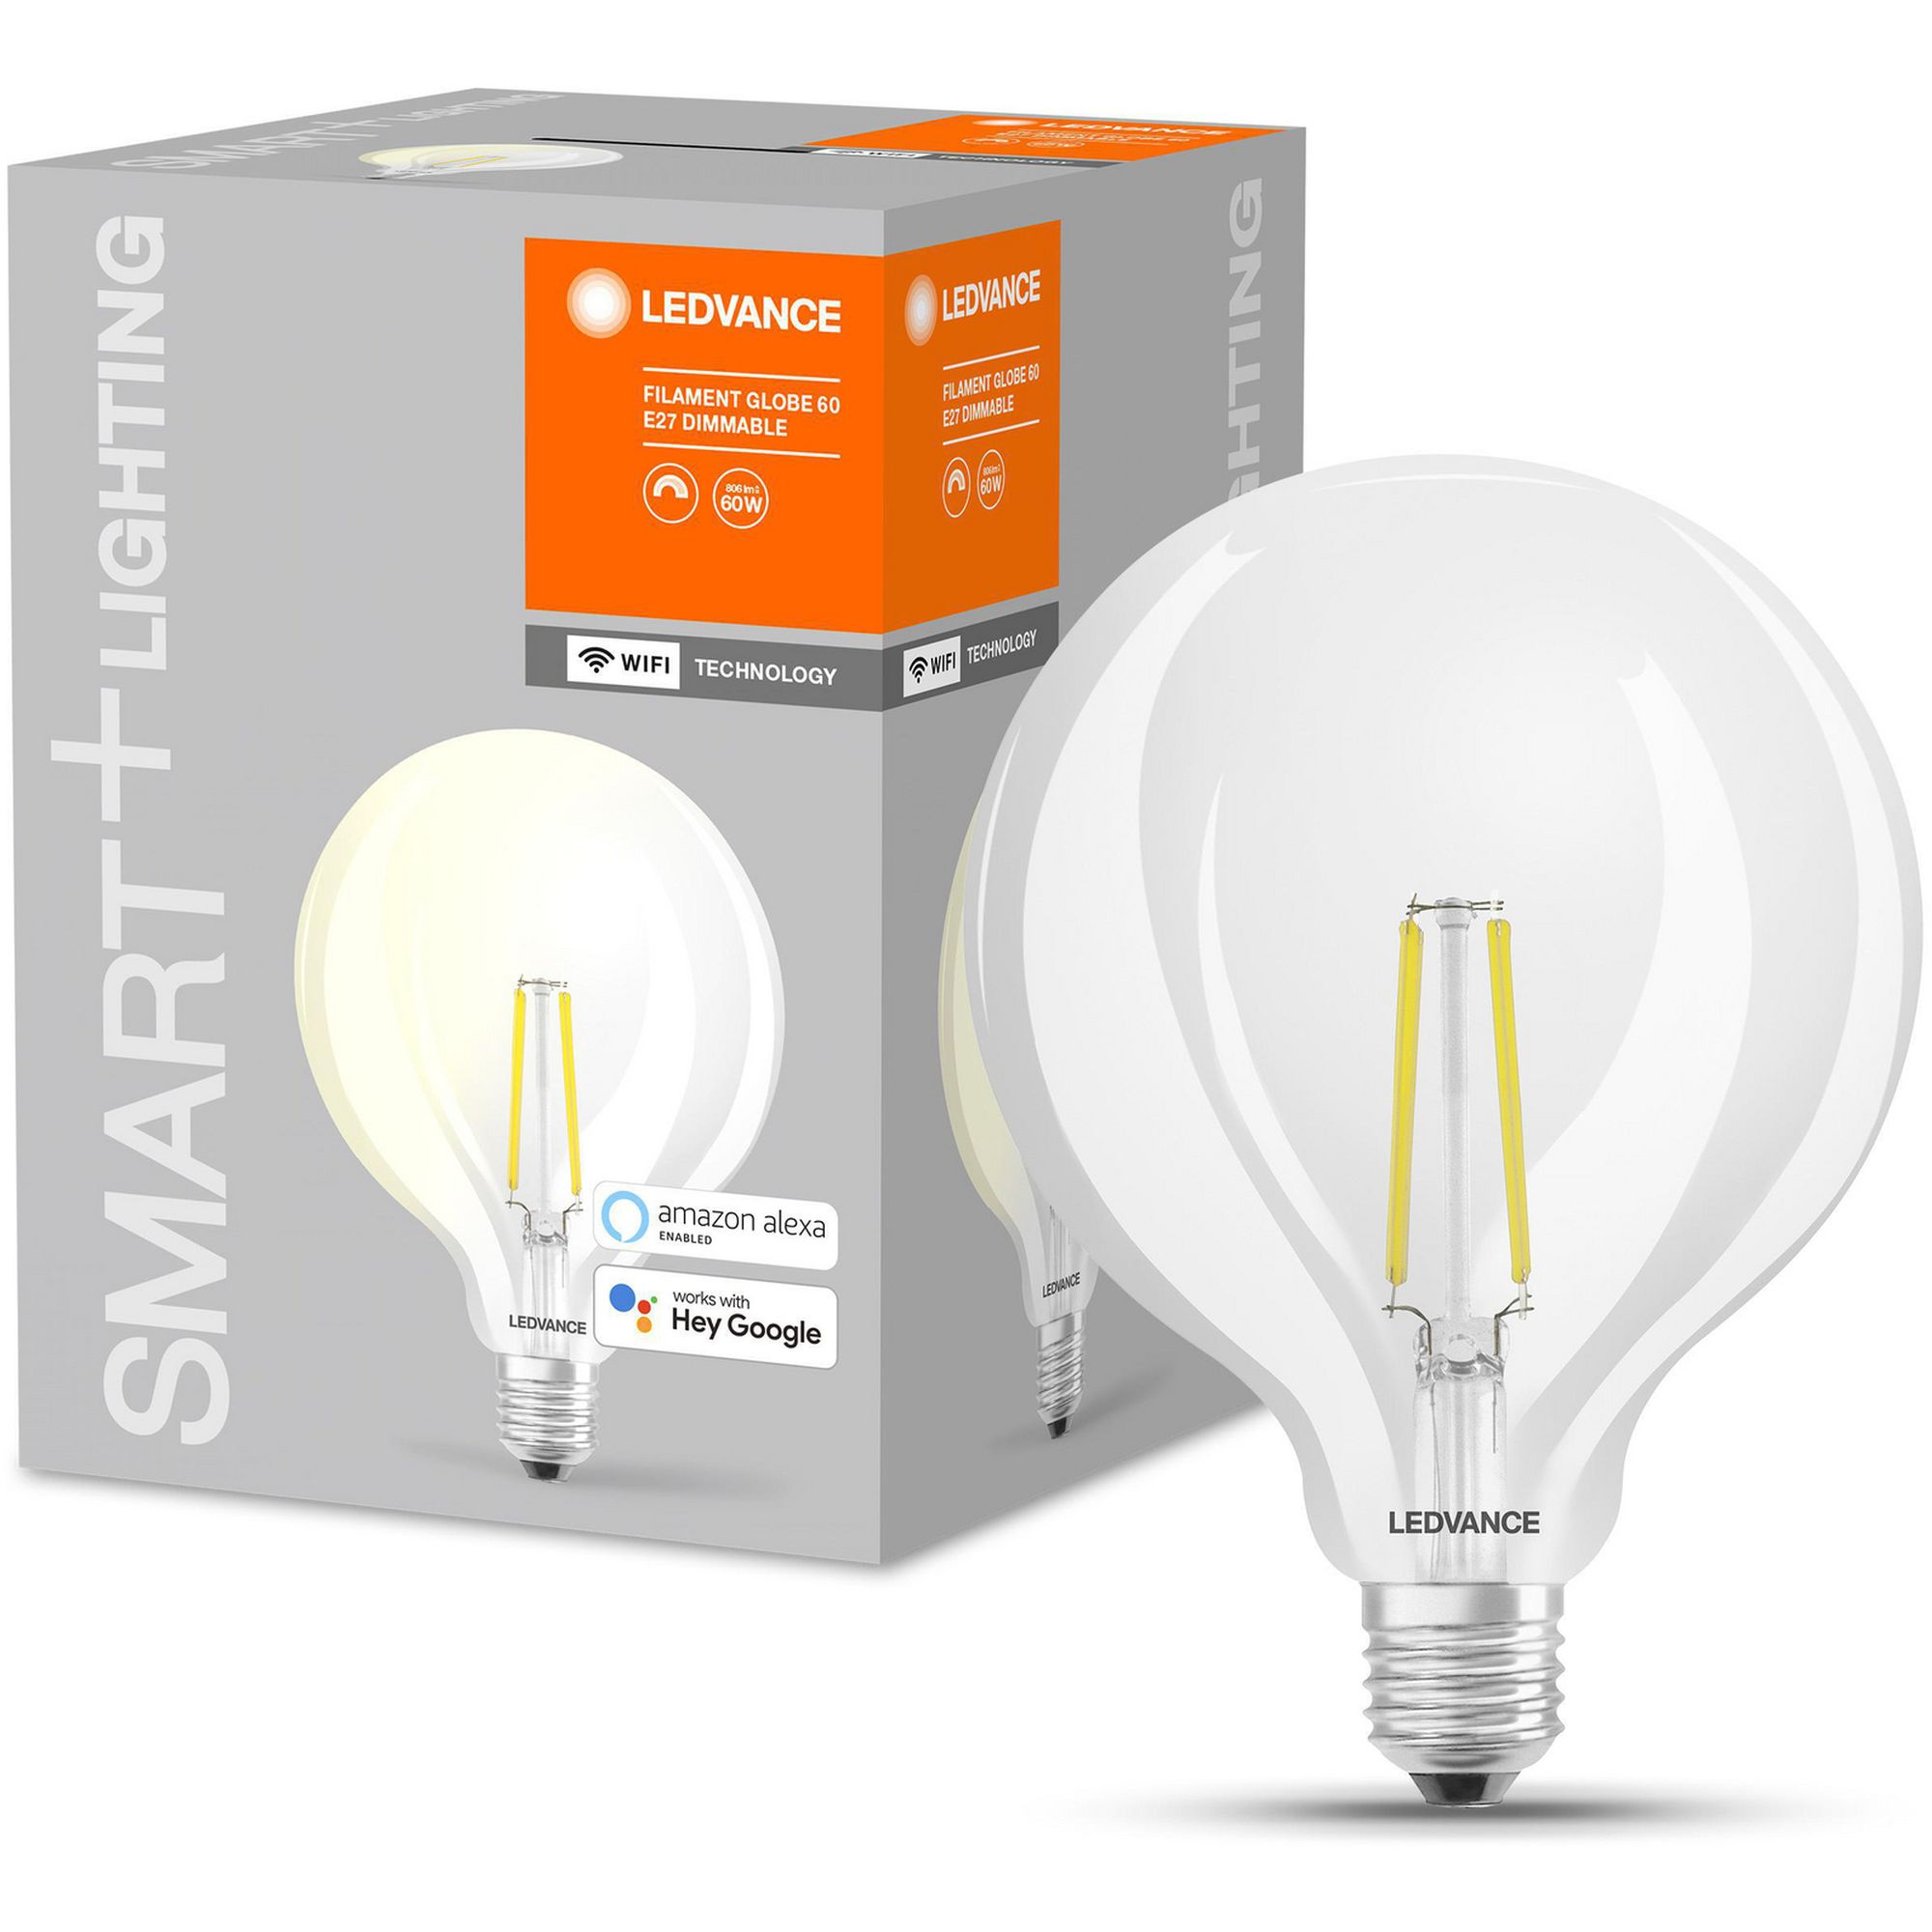 LEDVANCE - SMART+ Globe 60W/827 Clear Filament E27 WiFi